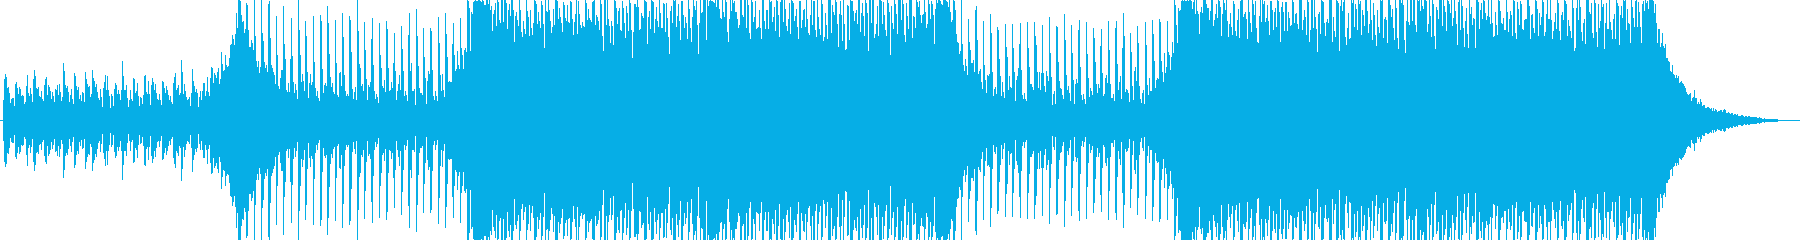 Corporate Orchestra 2の再生済みの波形